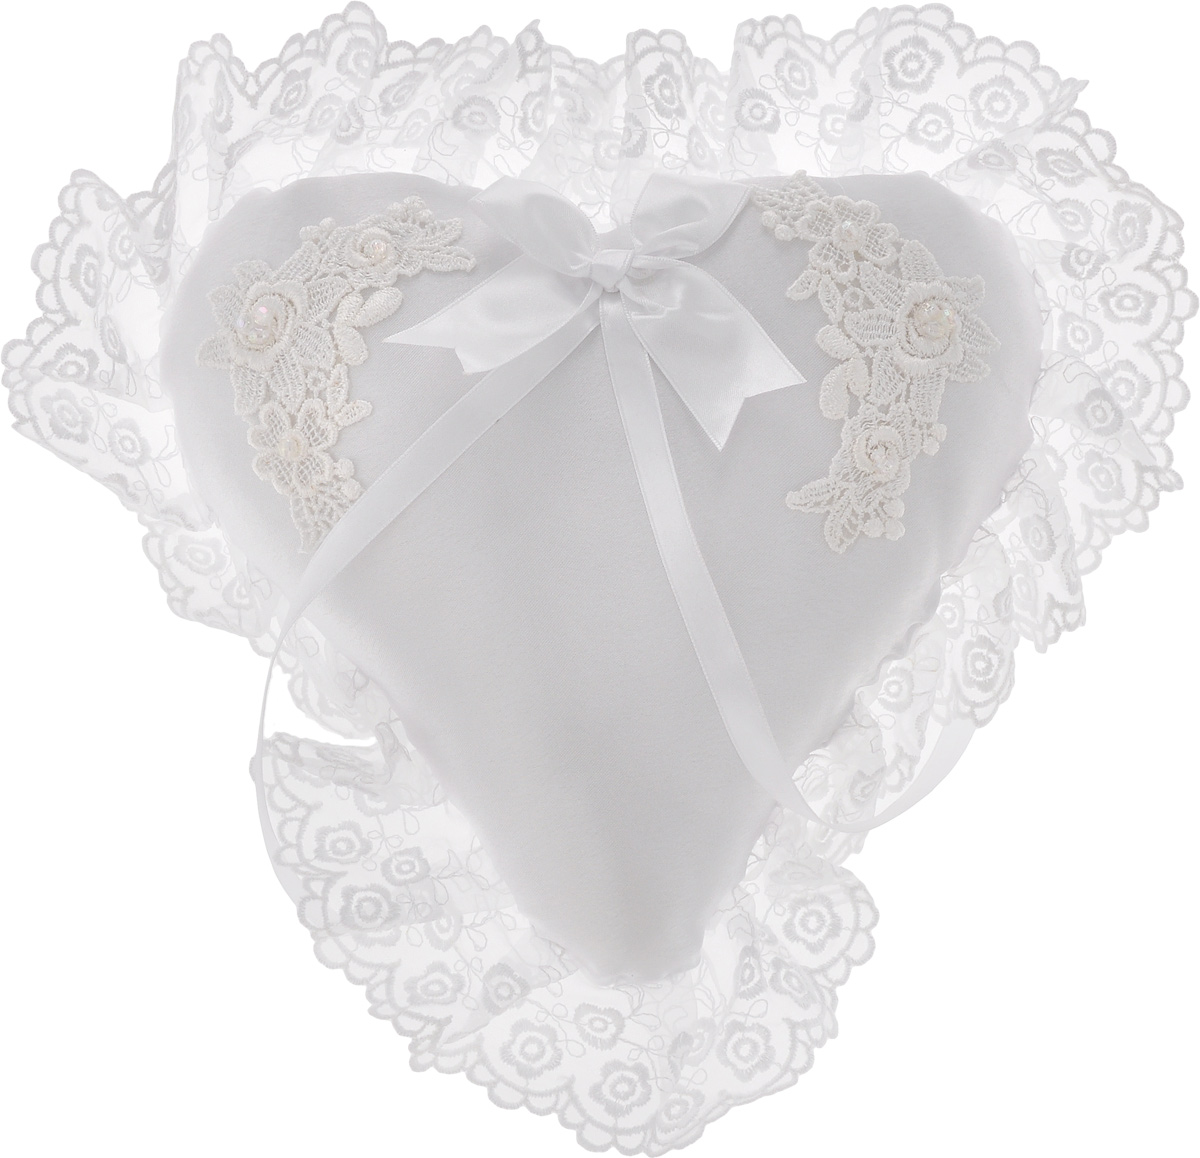 Подушечка для колец Bianco Sole  Свадебная , 30 х 30 см